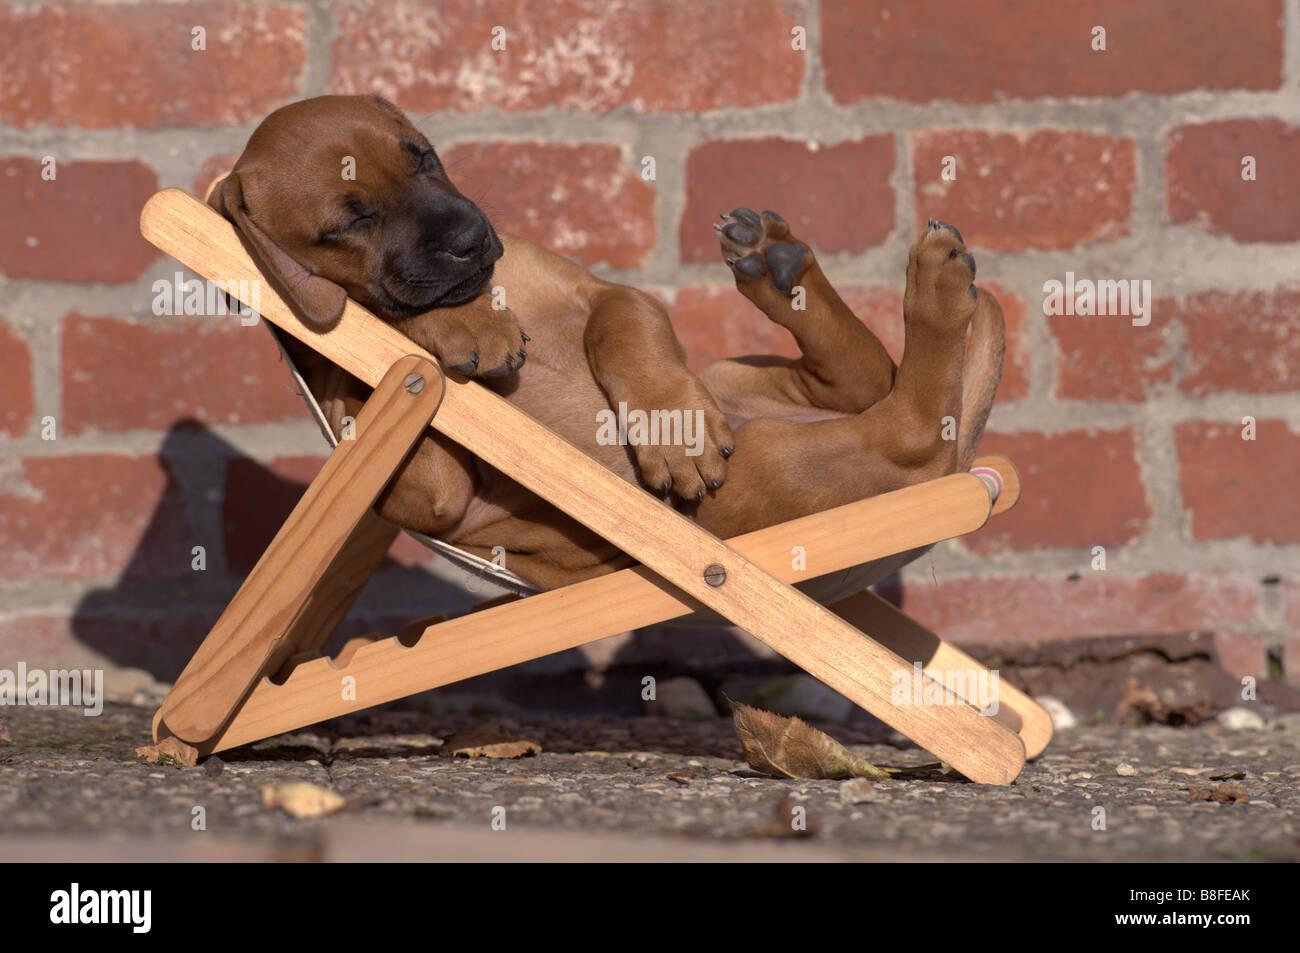 Rhodesian Ridgeback (Canis lupus familiaris), sleeping in a dolls sunchair - Stock Image